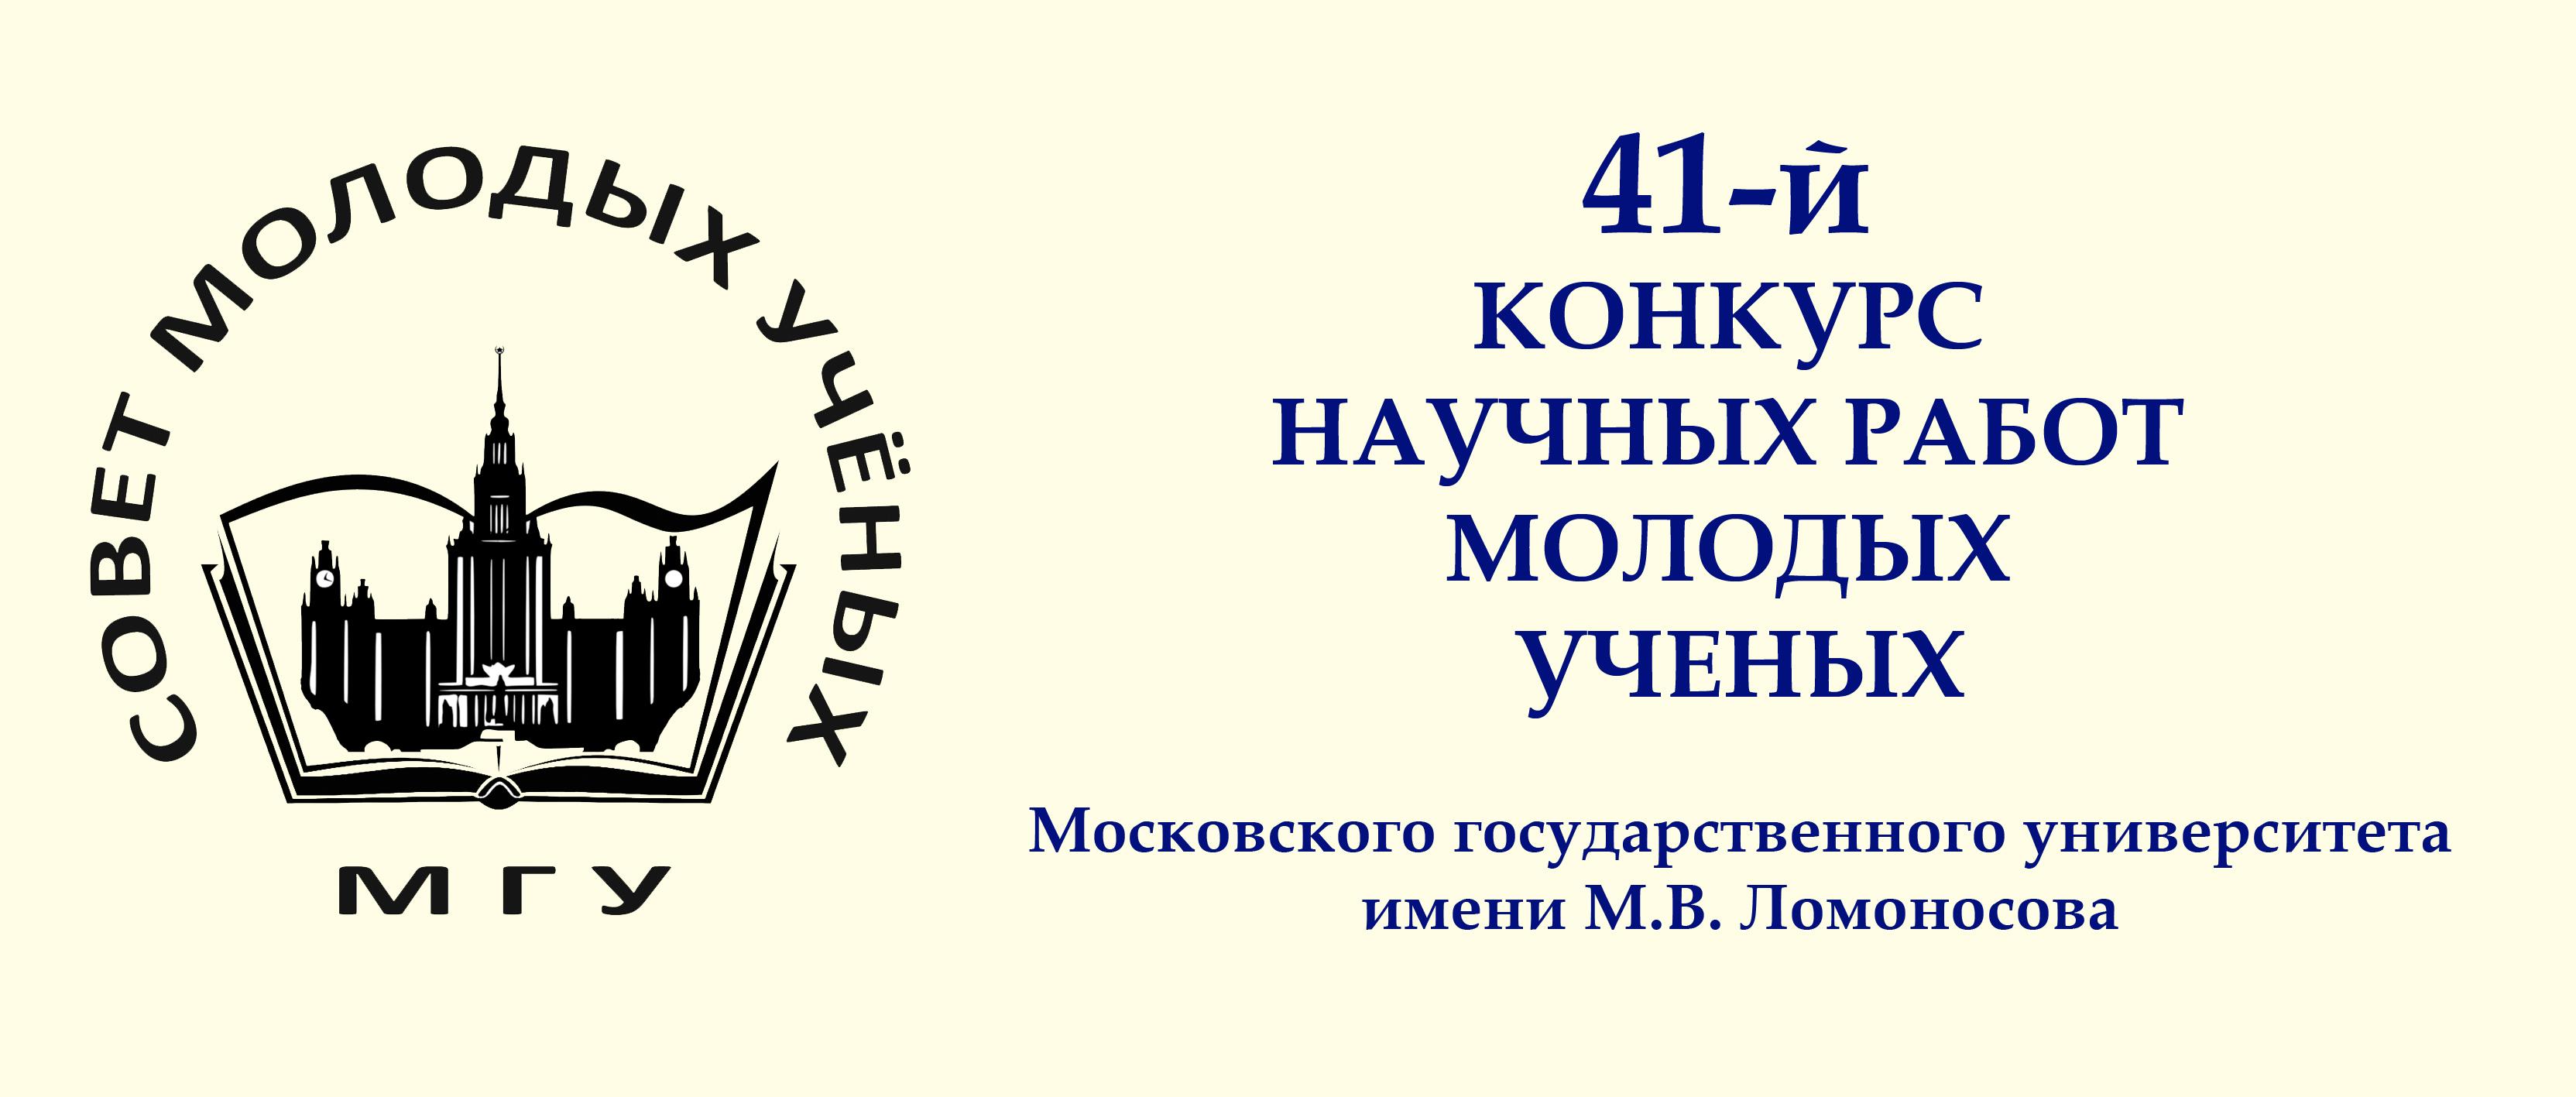 Конкурс научных работ молодых учёных МГУ